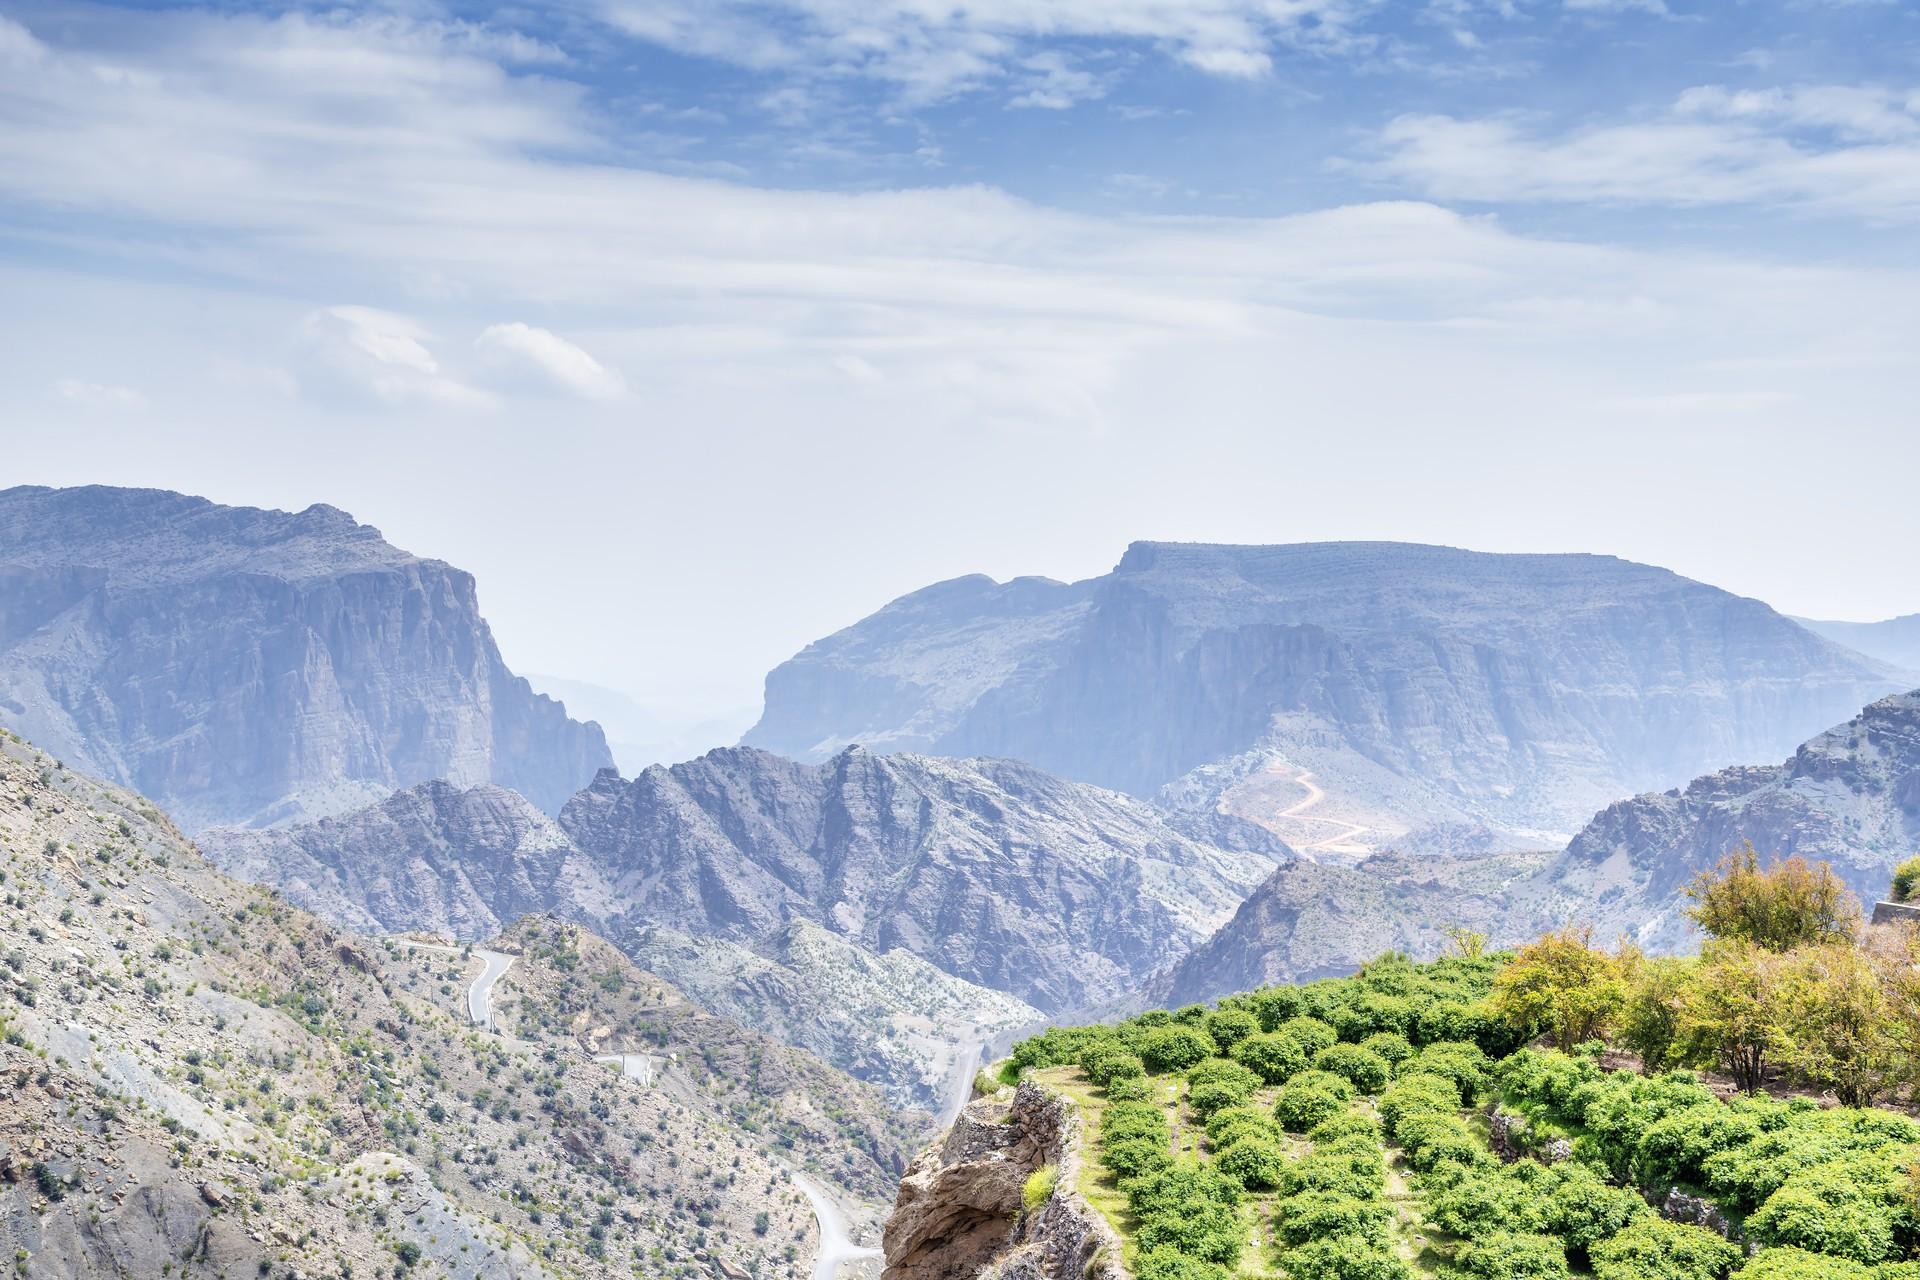 Oman's Hajar Mountains are the perfect off-season holiday destination